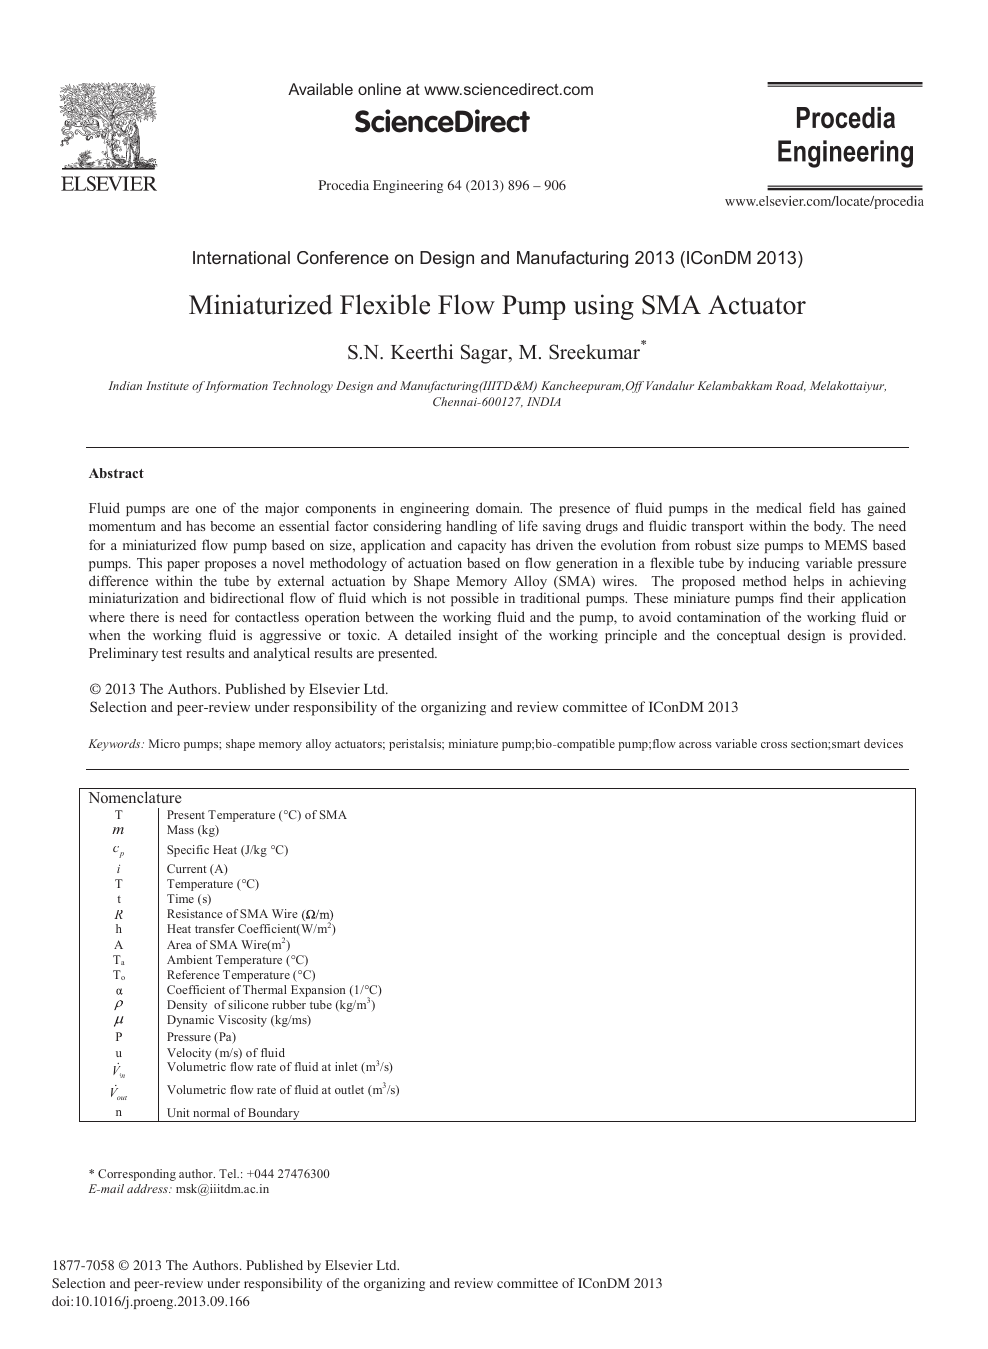 Miniaturized Flexible Flow Pump Using SMA Actuator – topic